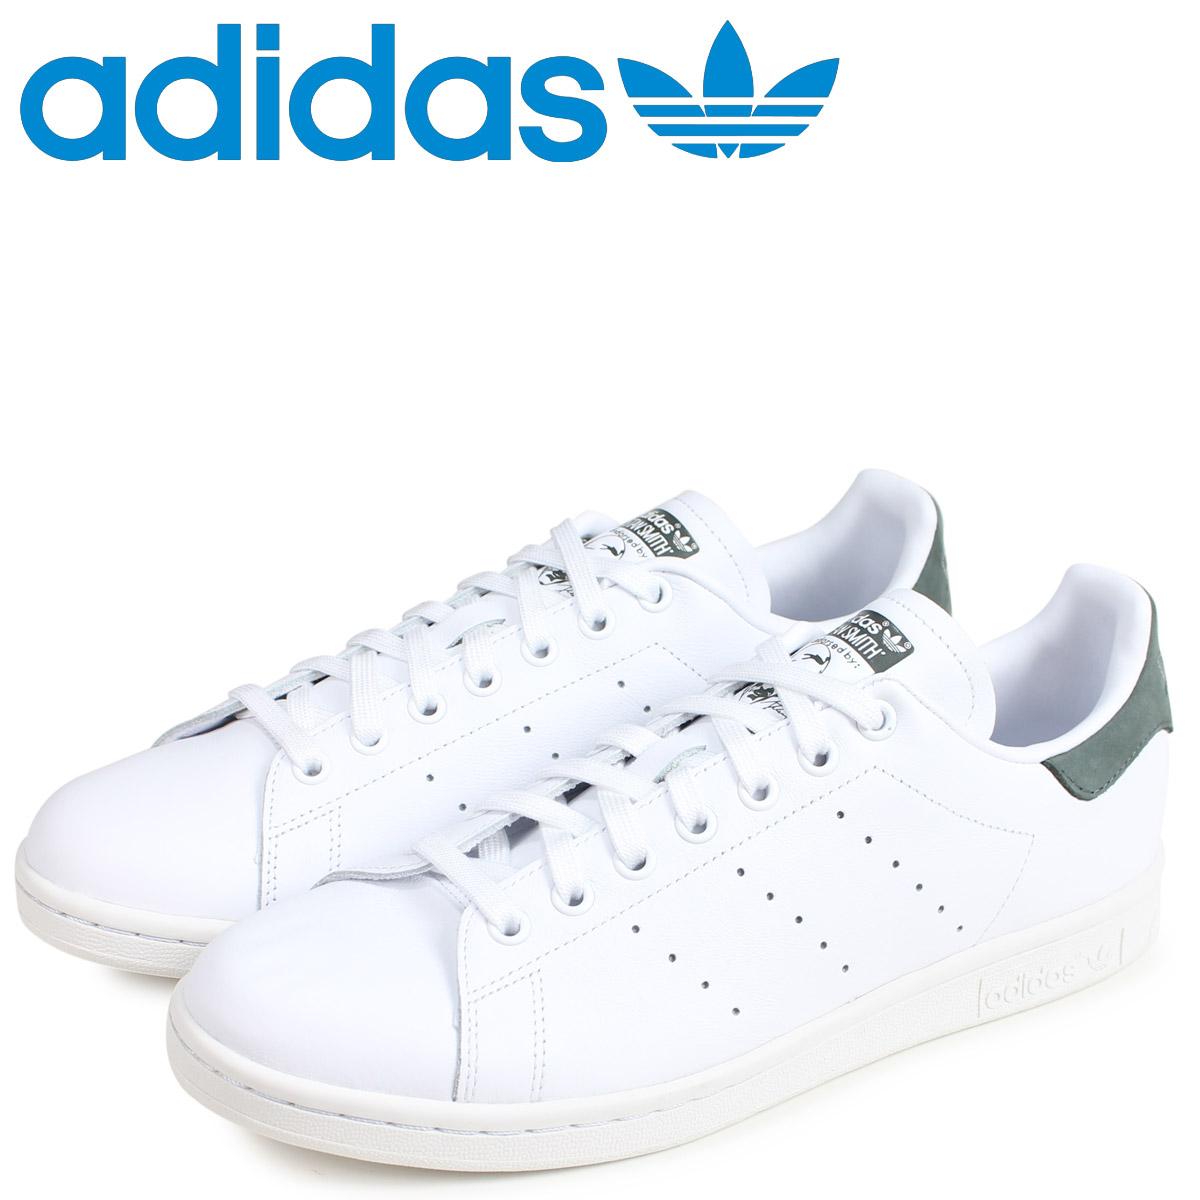 adidas Originals アディダス オリジナルス スタンスミス スニーカー メンズ STAN SMITH ホワイト 白 BD7444